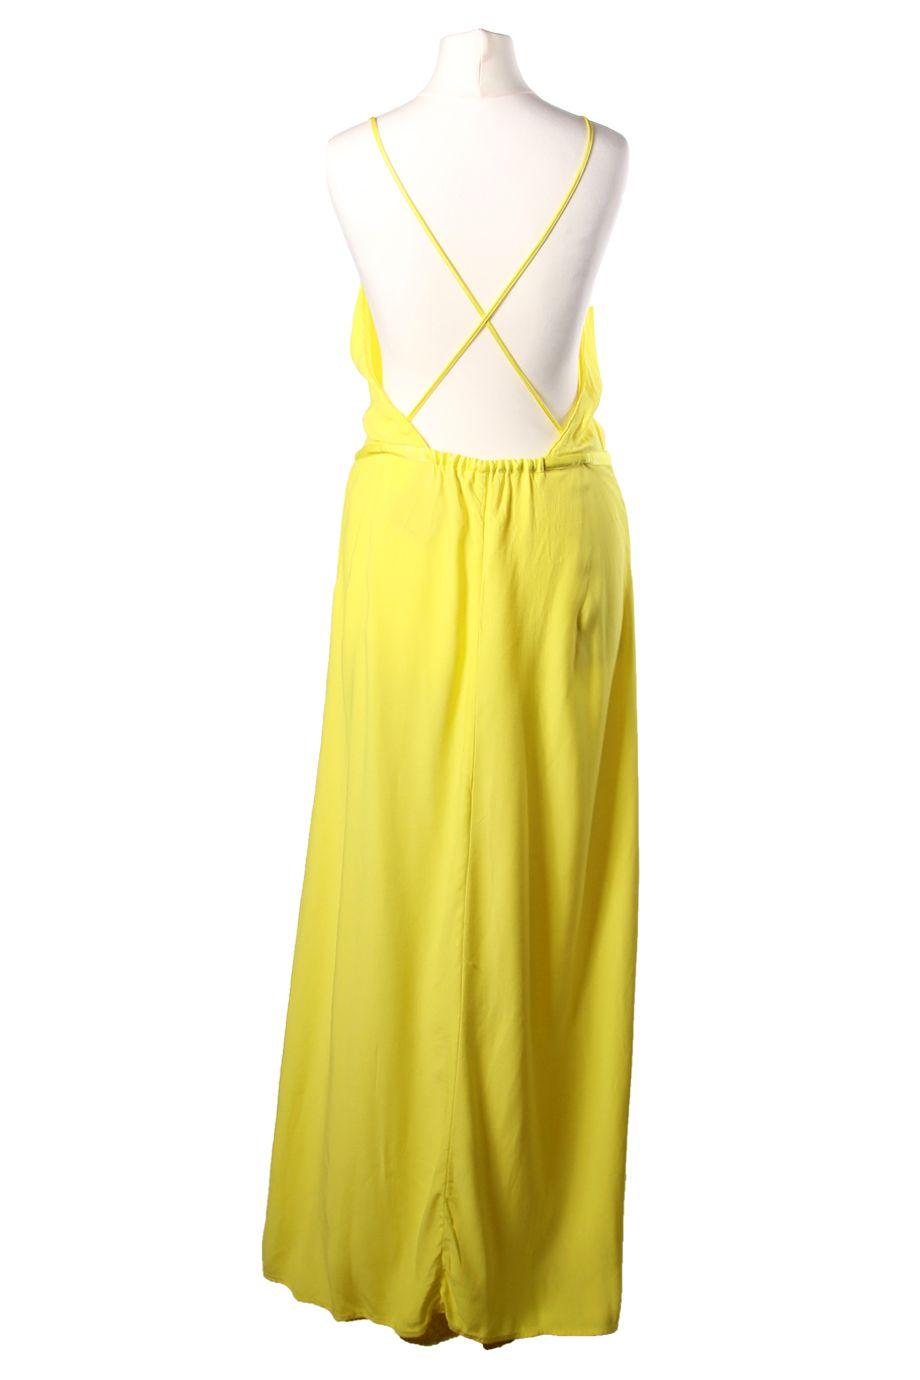 e8776e4ca43 Robe longue jaune fluo BA SH à emprunter Location Robe